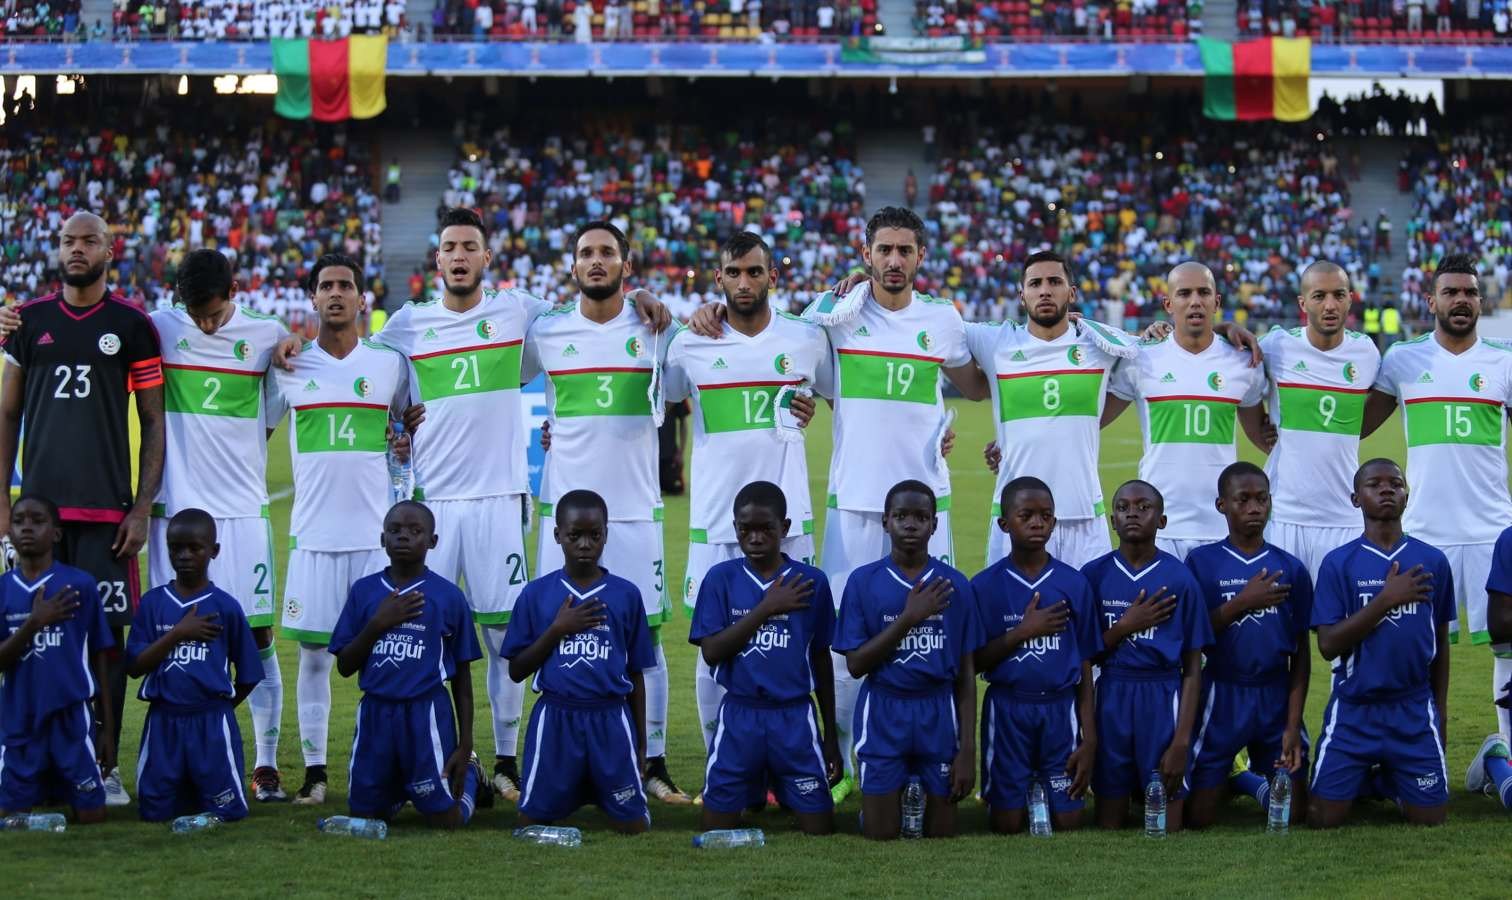 entree hymne algerie cameroun defaite